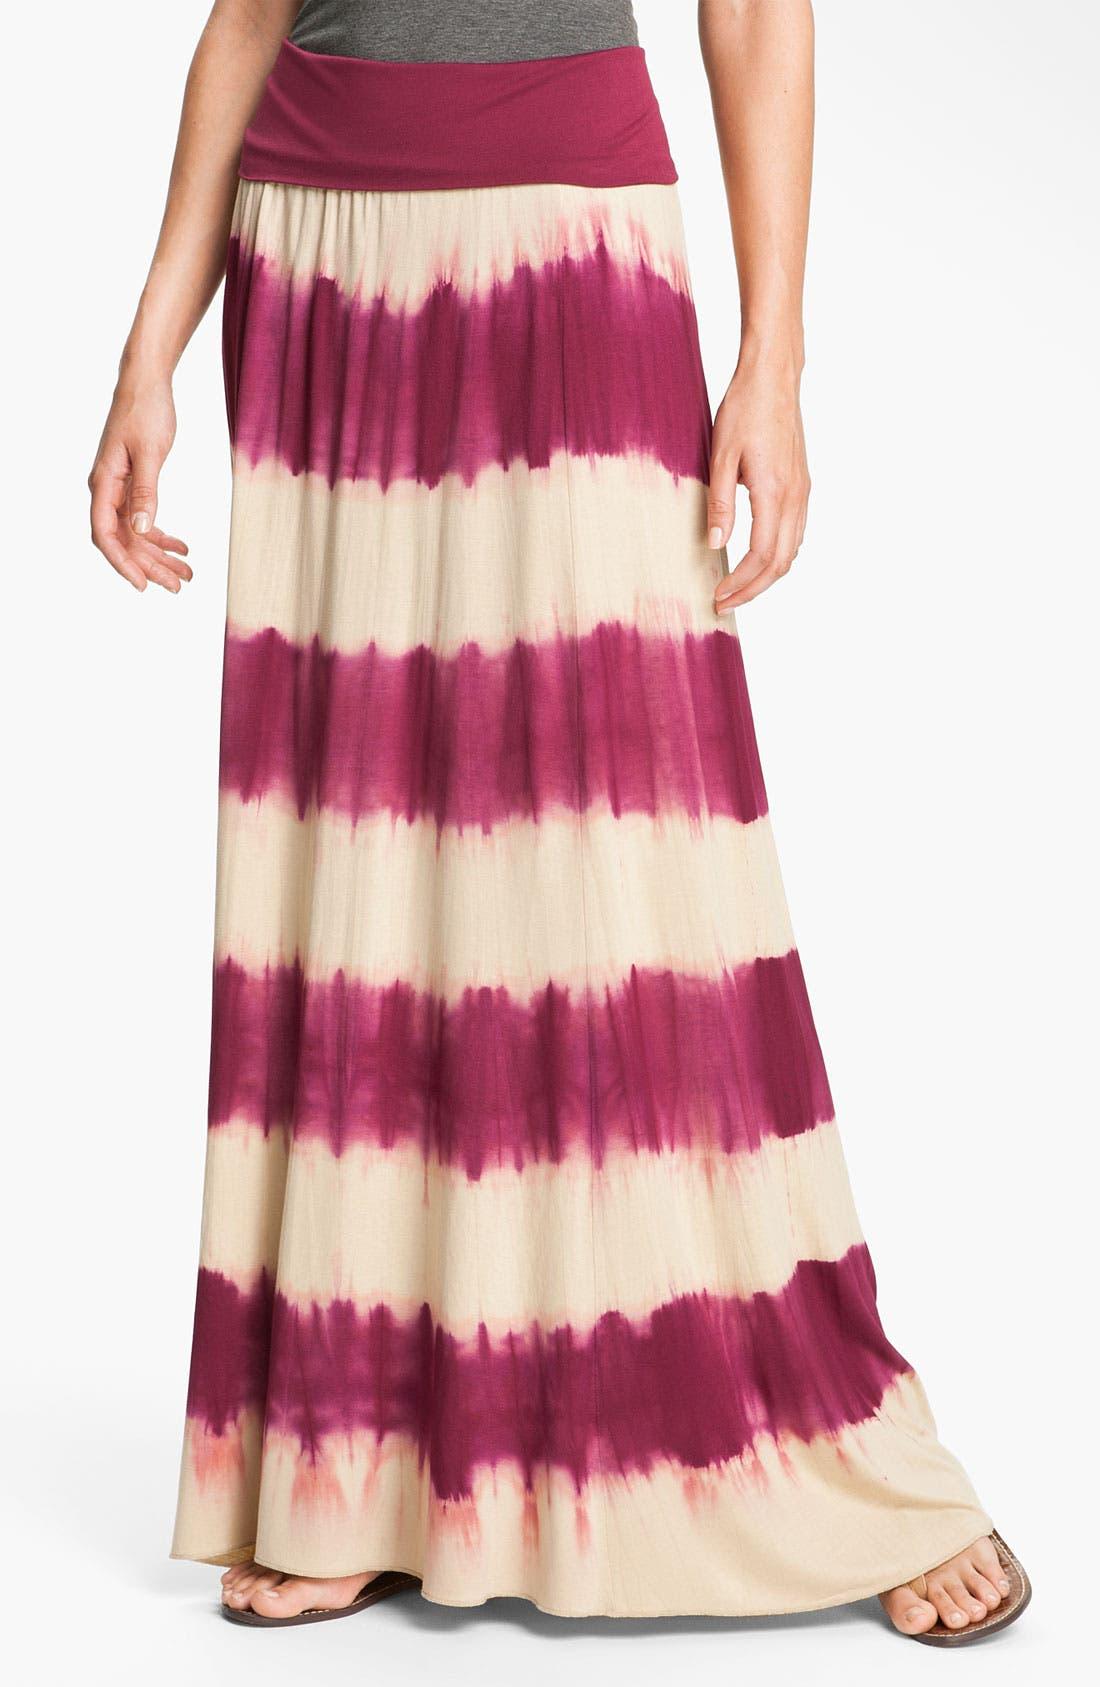 Alternate Image 1 Selected - Max & Mia Tie Dye Maxi Skirt